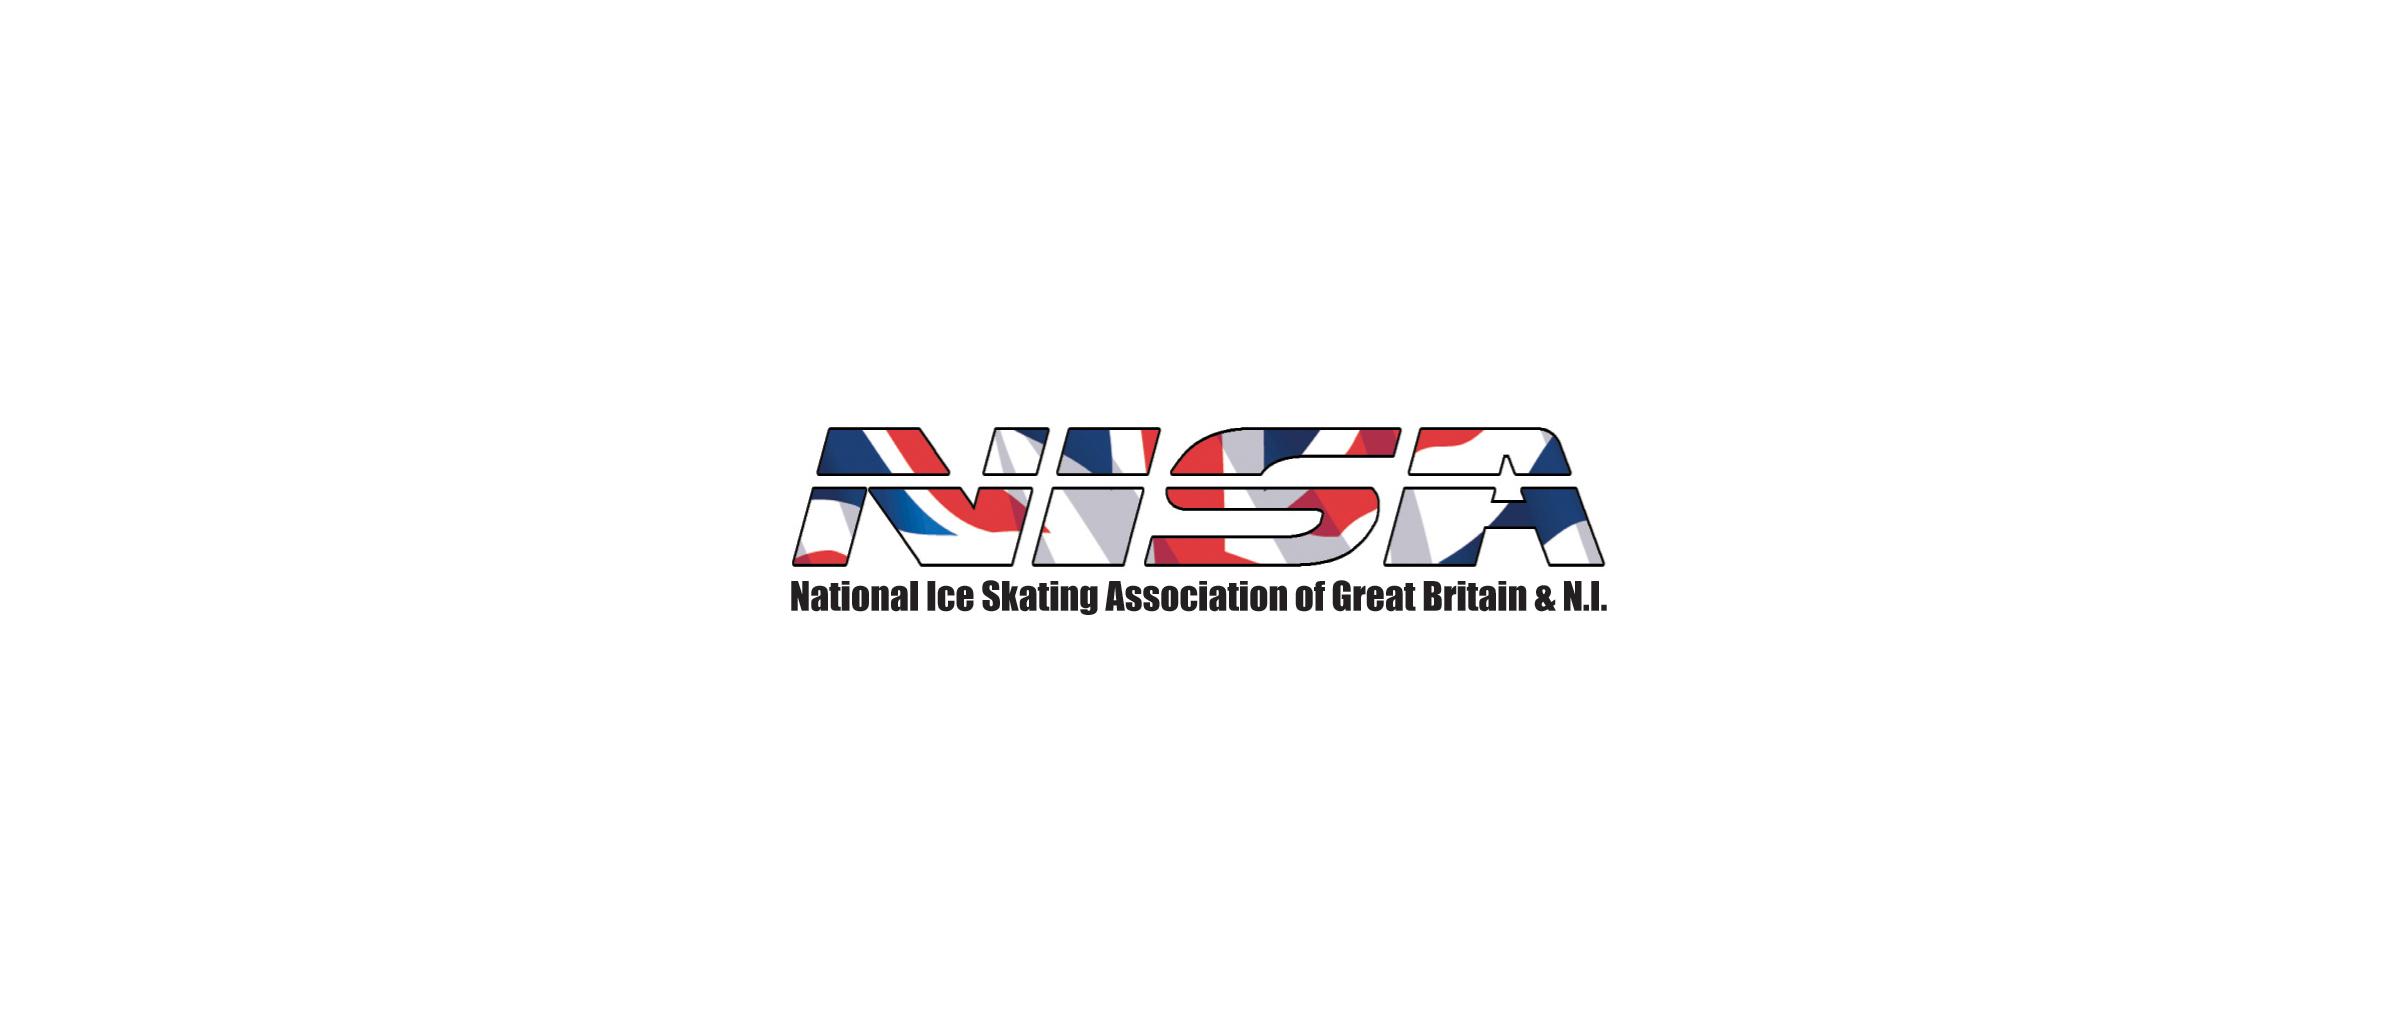 nisa logo white background